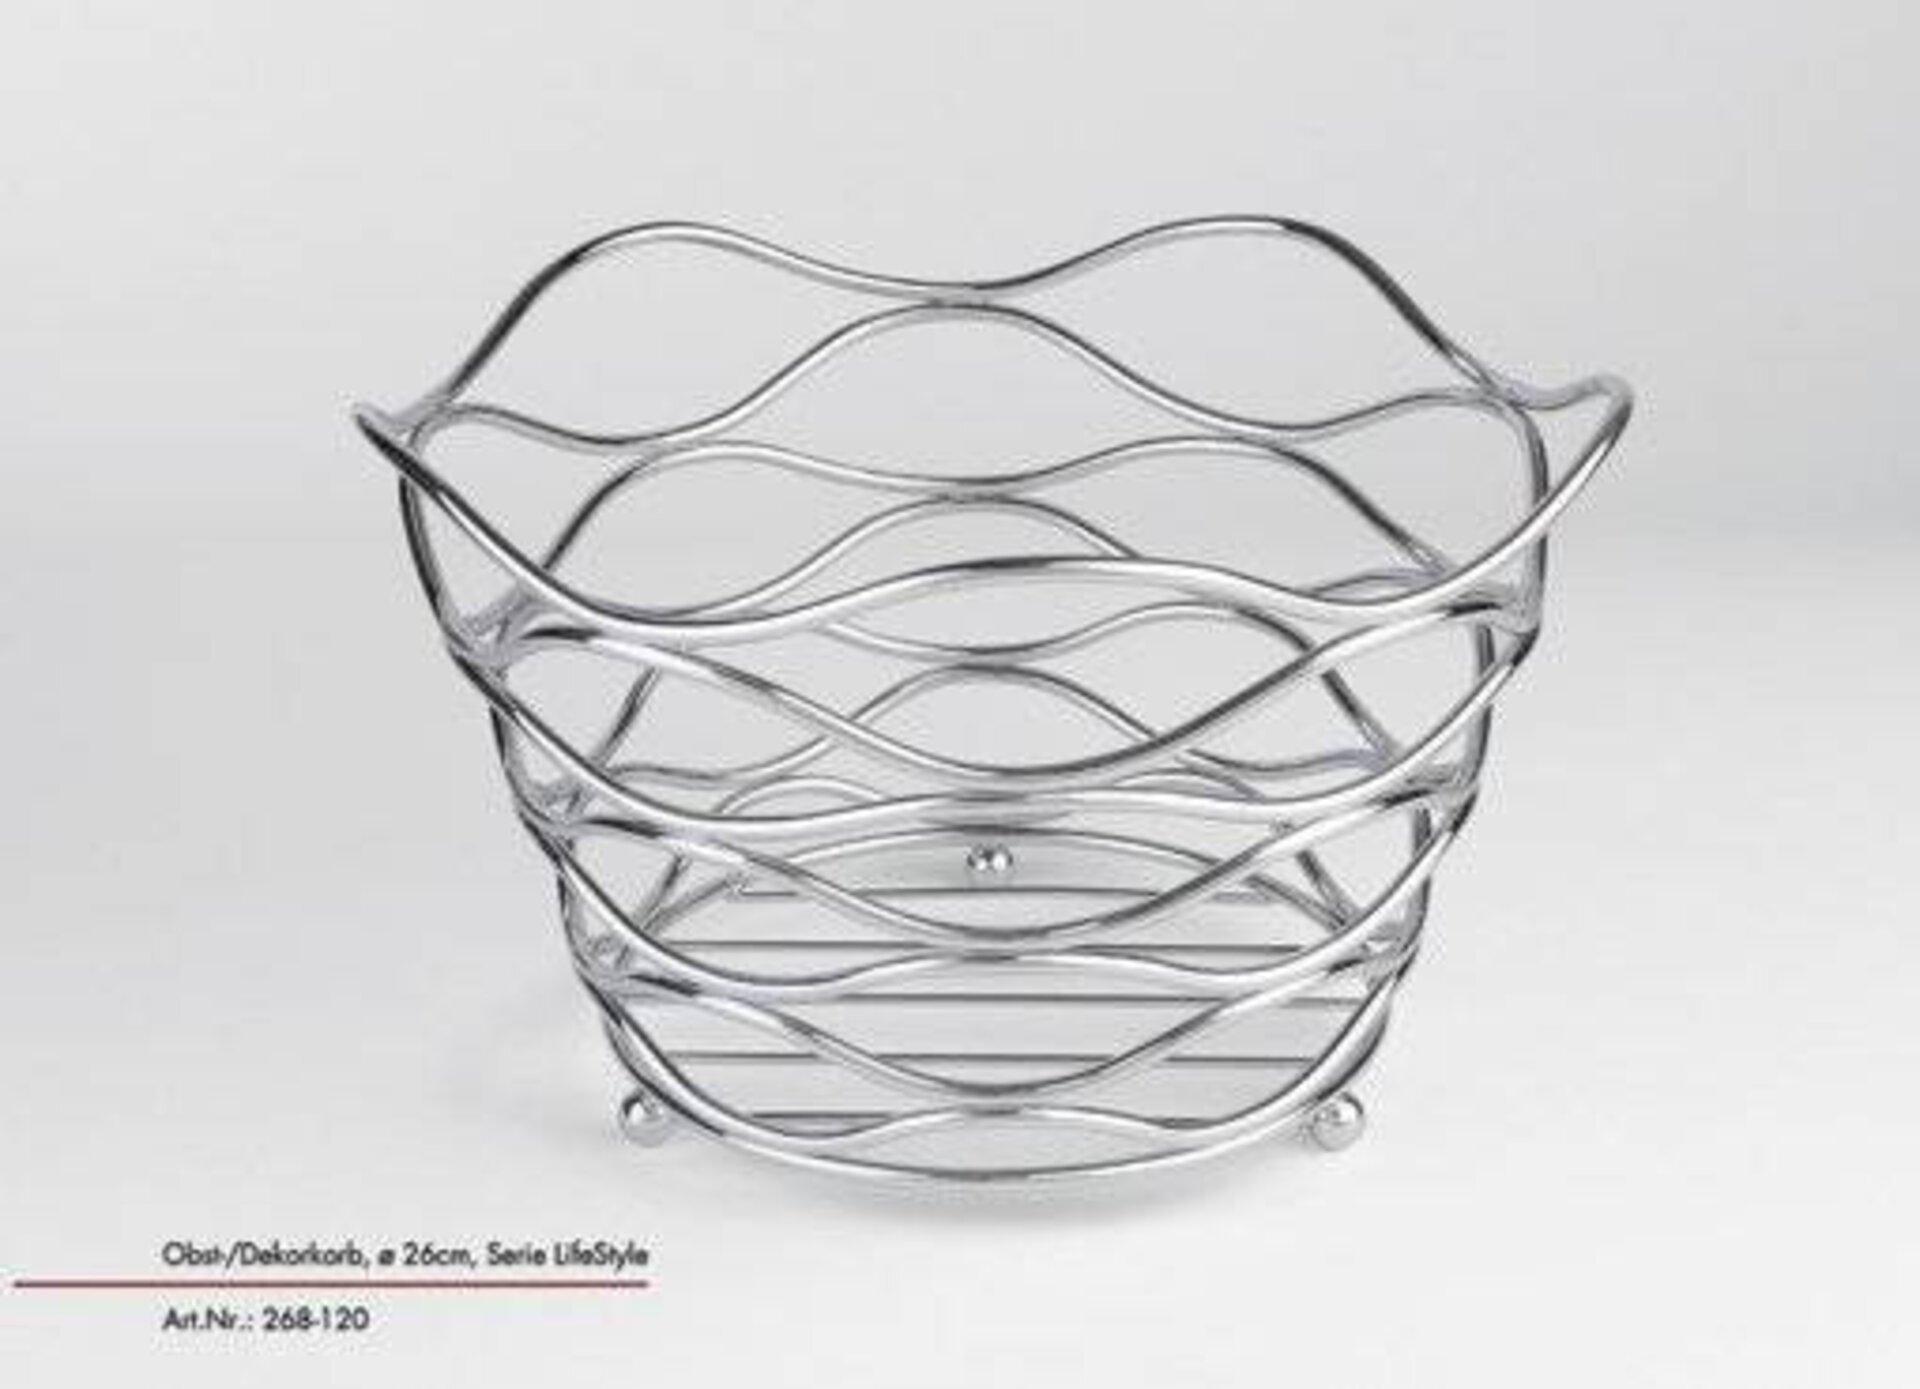 Obstkorb LifeStyle Justinus Bestecke Metall 26 x 16 x 26 cm